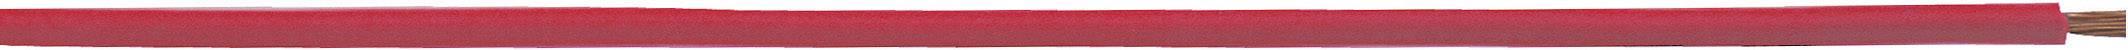 Opletenie / lanko LappKabel 4510053S H05V-K, 1 x 1 mm², vonkajší Ø 2.80 mm, 250 m, biela